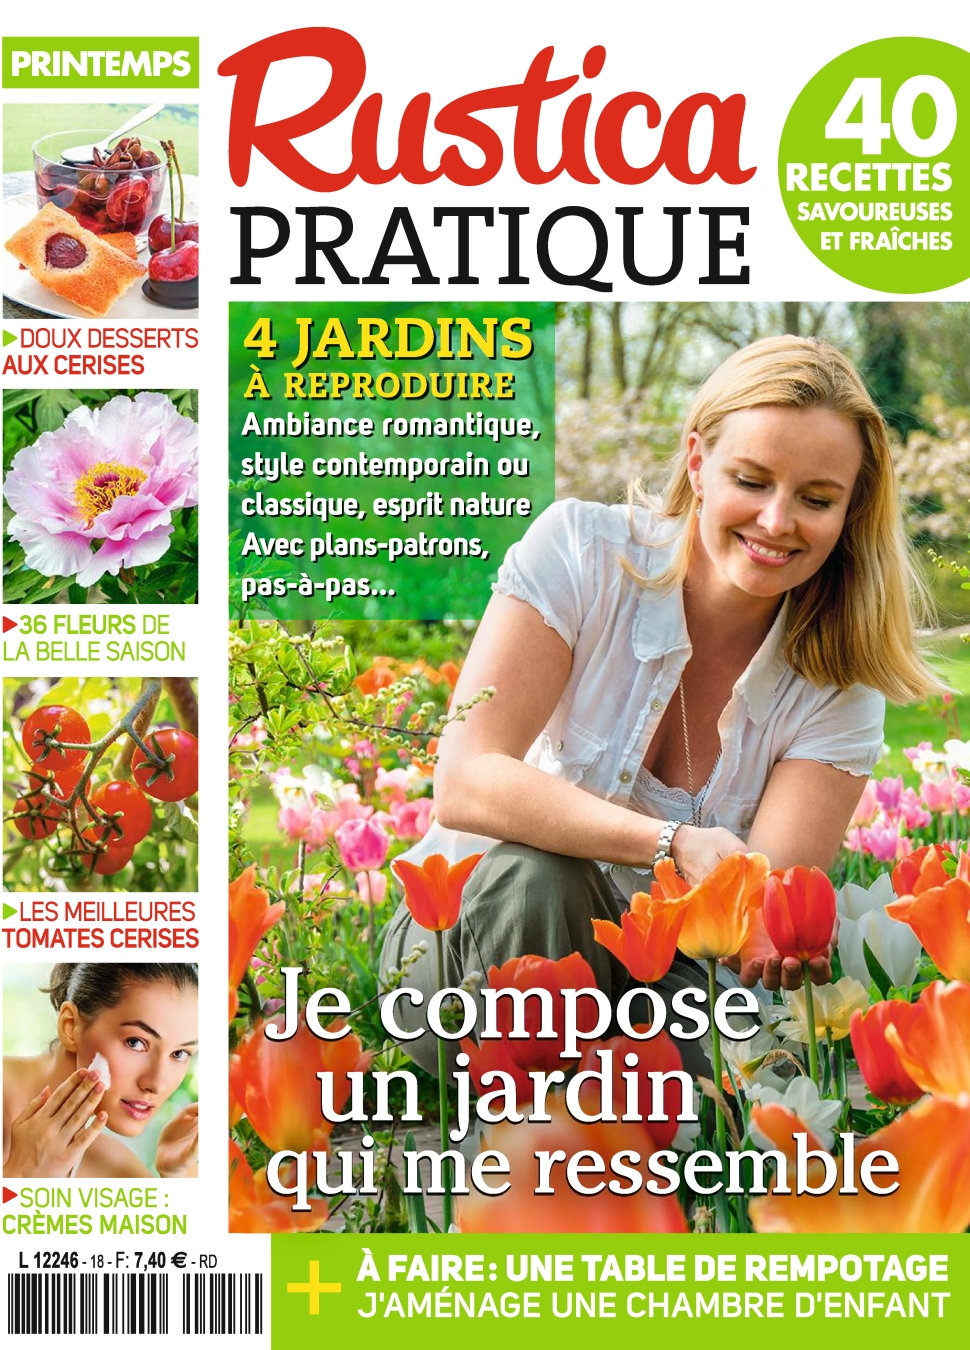 Rustica Pratique N°18 - Printemps 2016